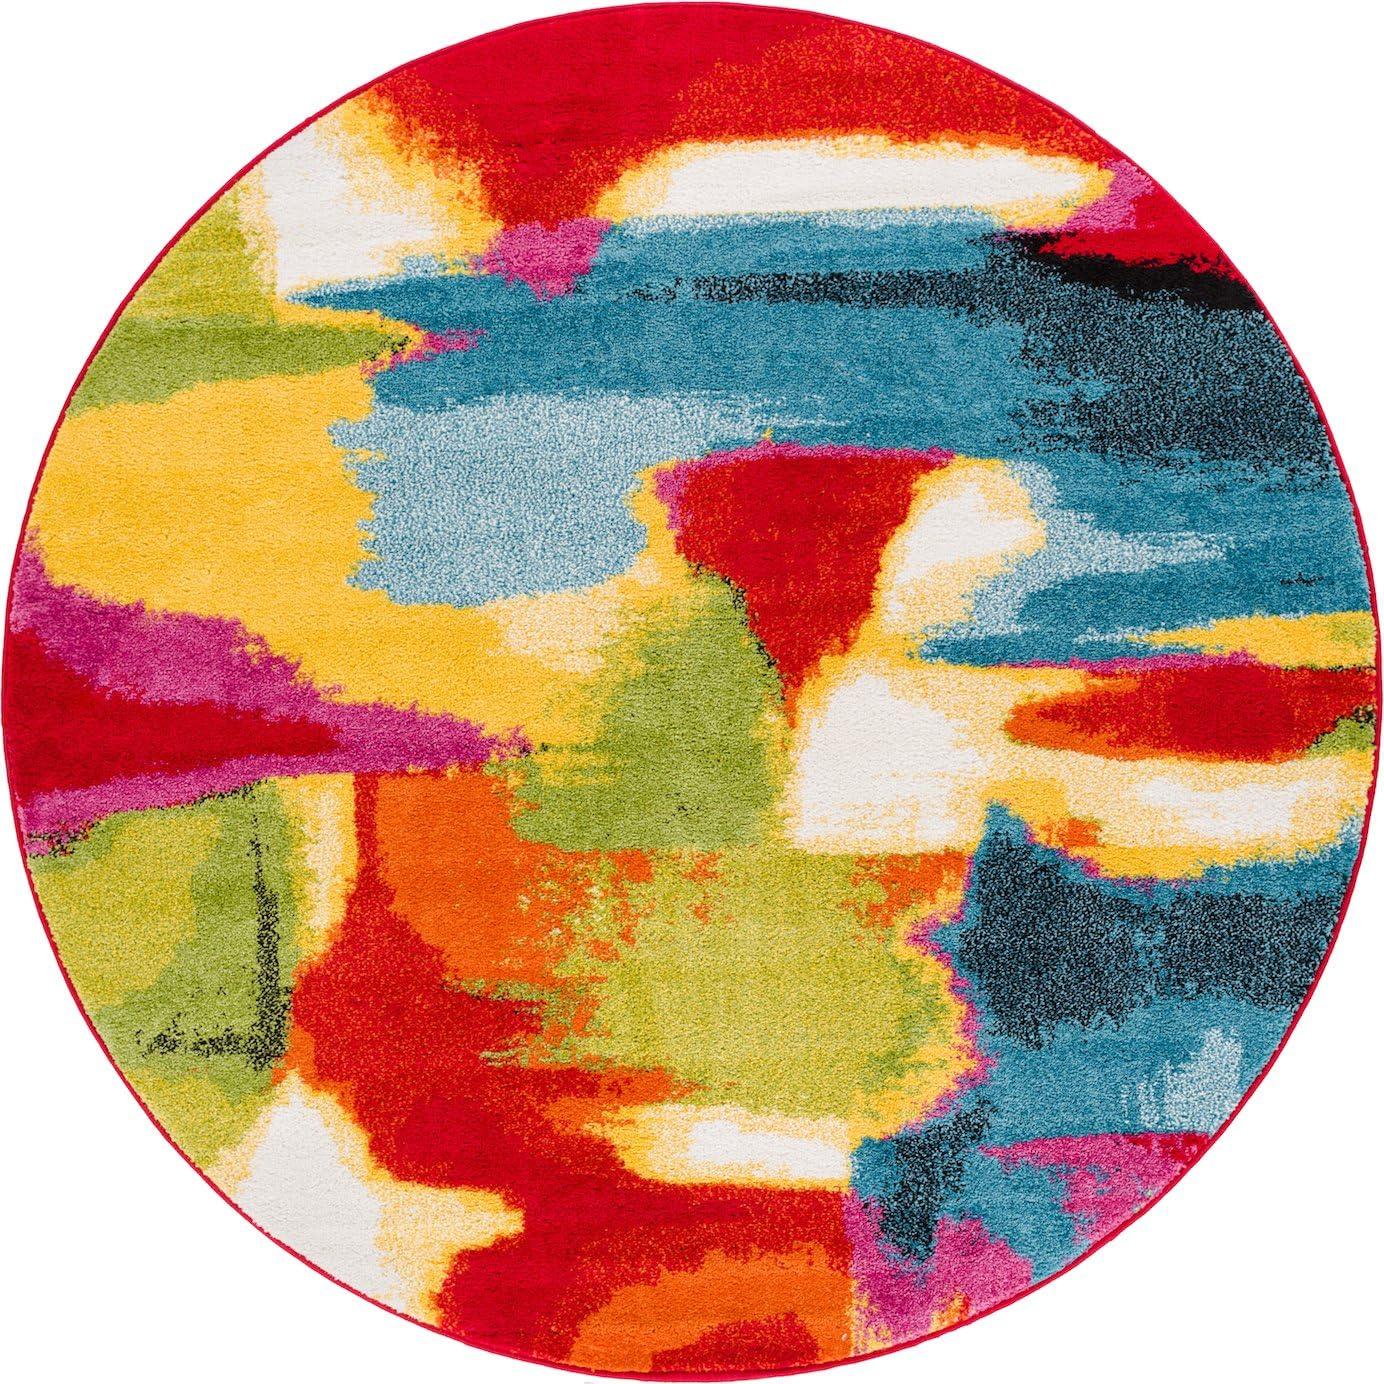 HomeWay Blurry 5 3 Round Vivid rainbow-colored soft Rug Mid-century modern Velvety bright soft Area Rug